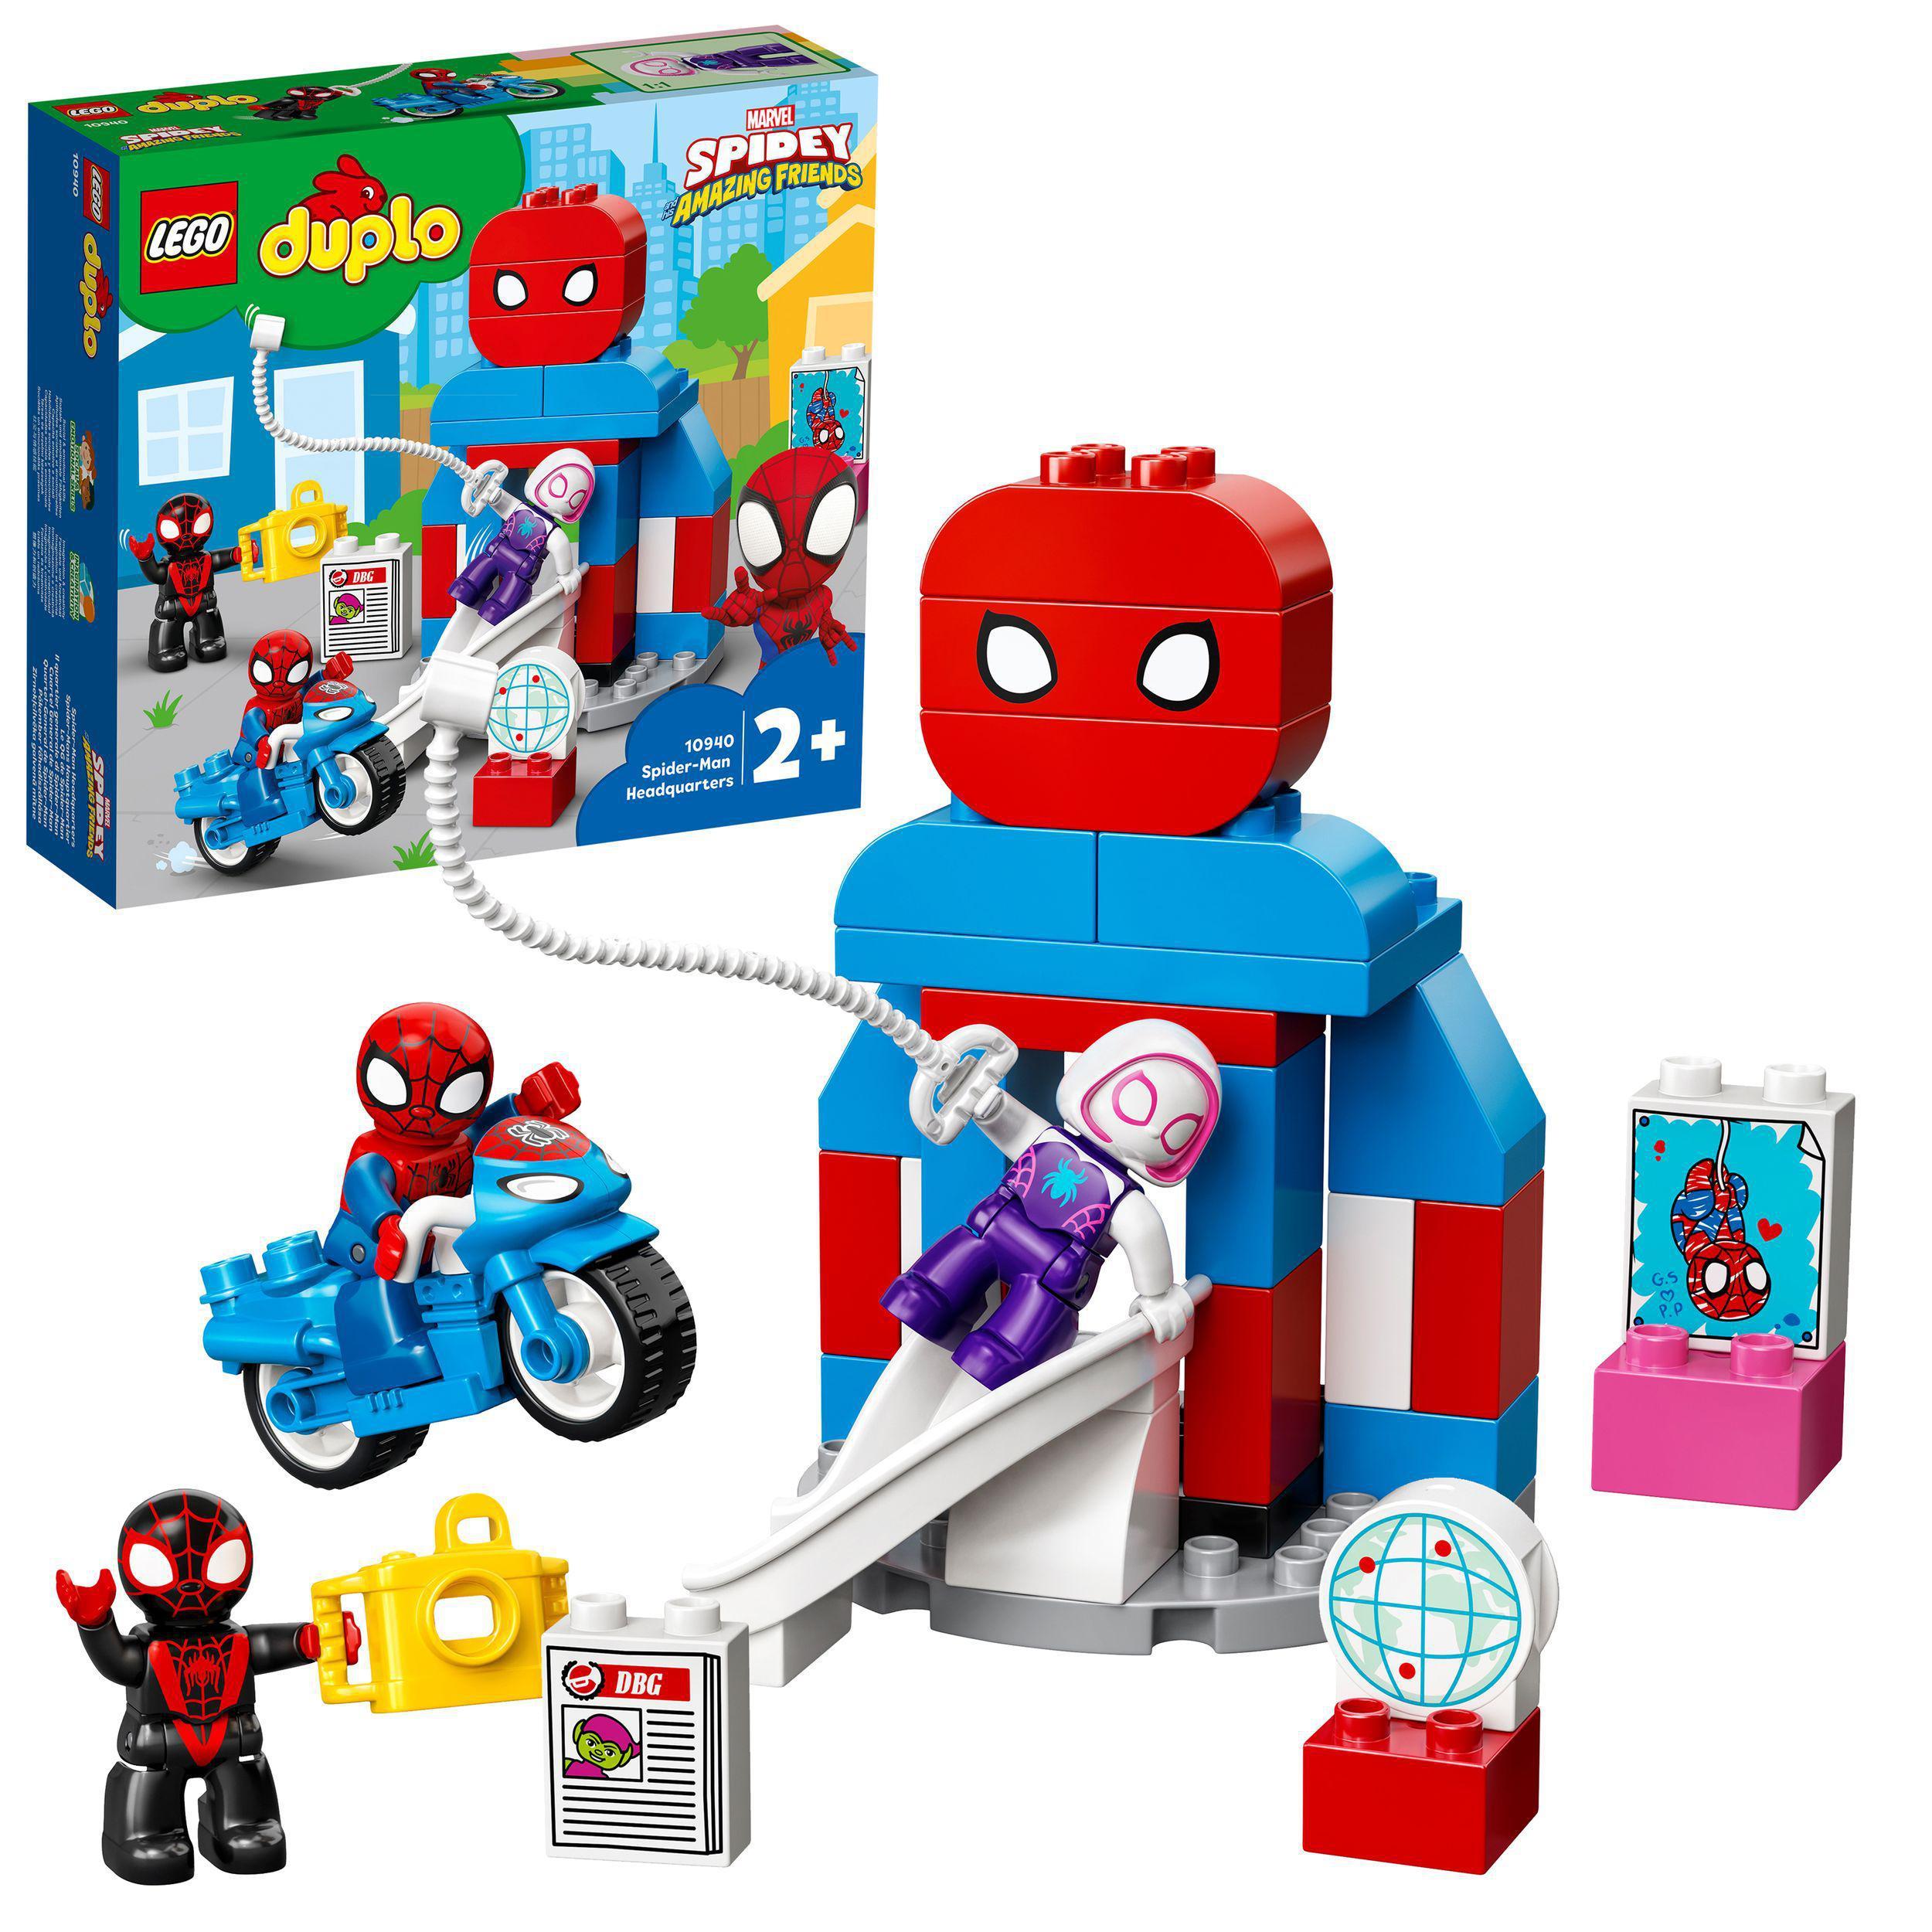 LEGO DUPLO - Spider-Man Headquarters (10940)